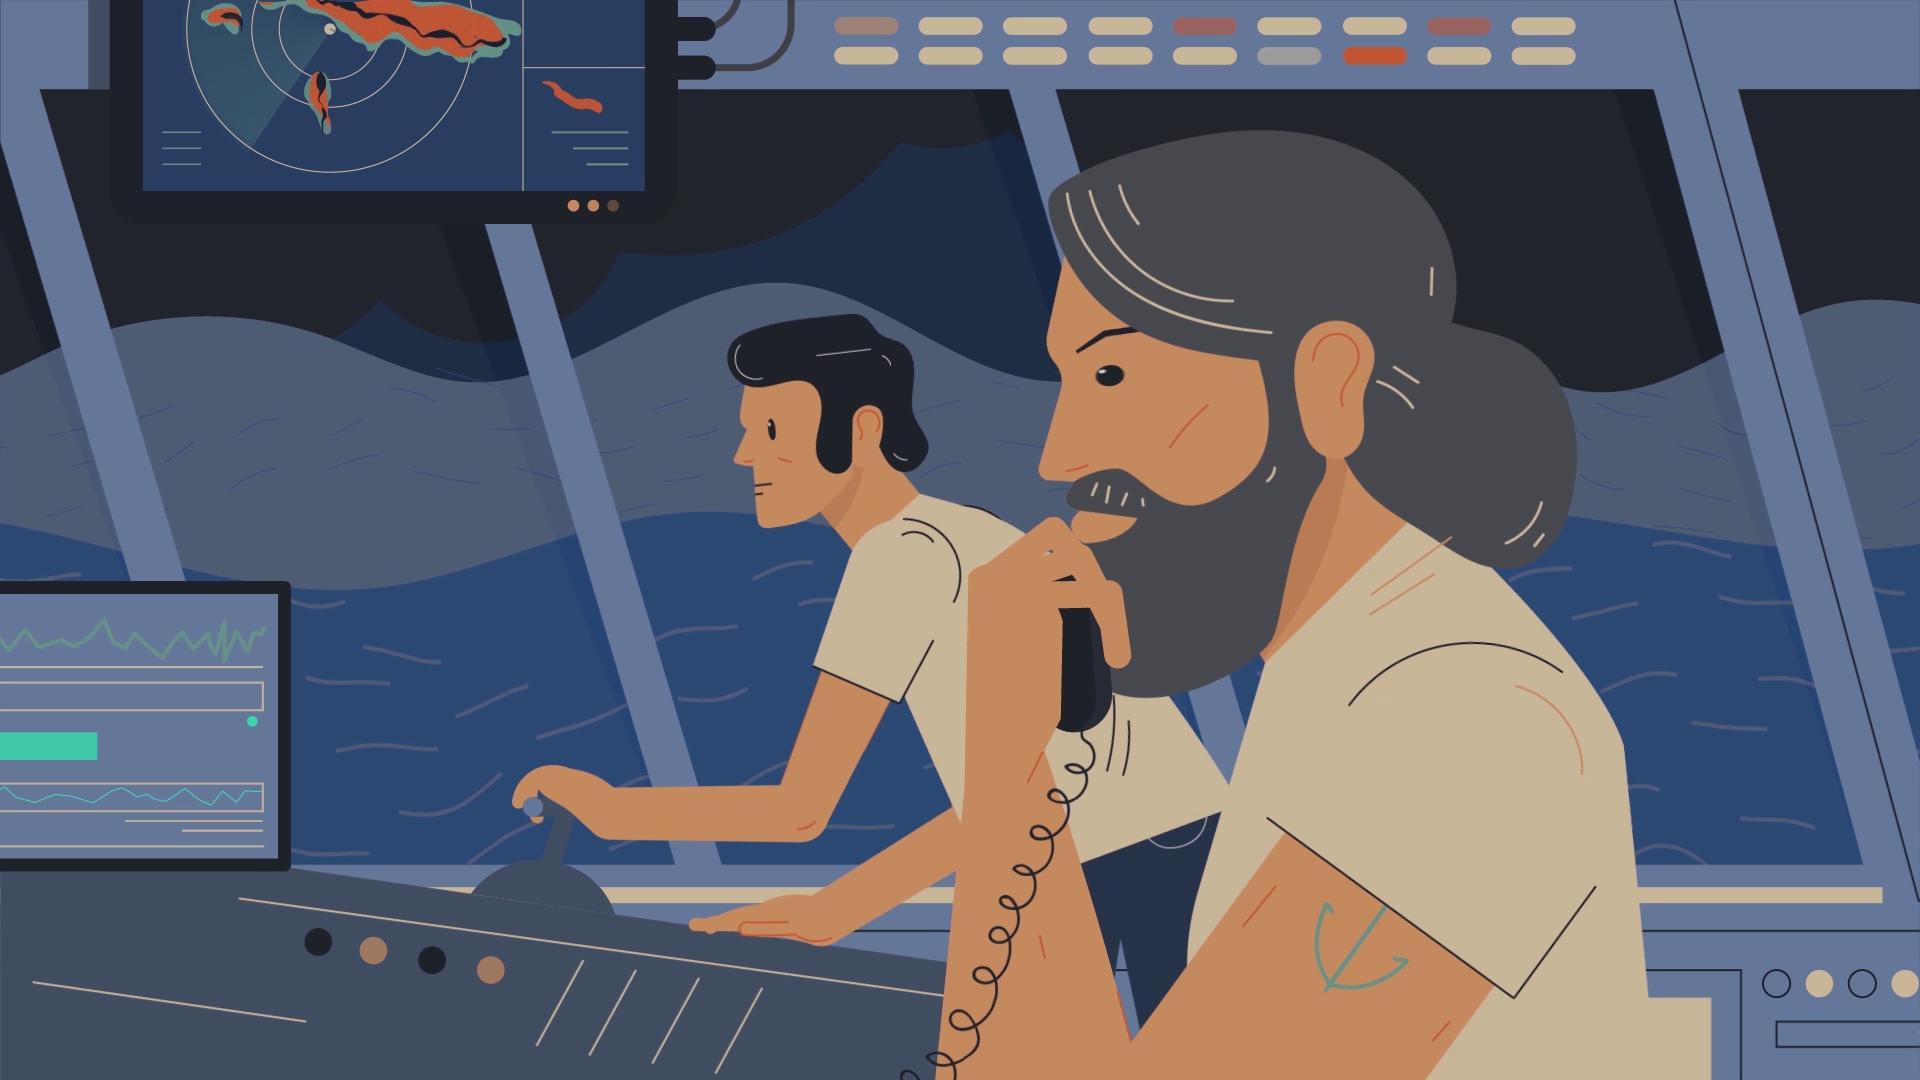 Captain of the ship | Innovative Sailing Simulator Explainer